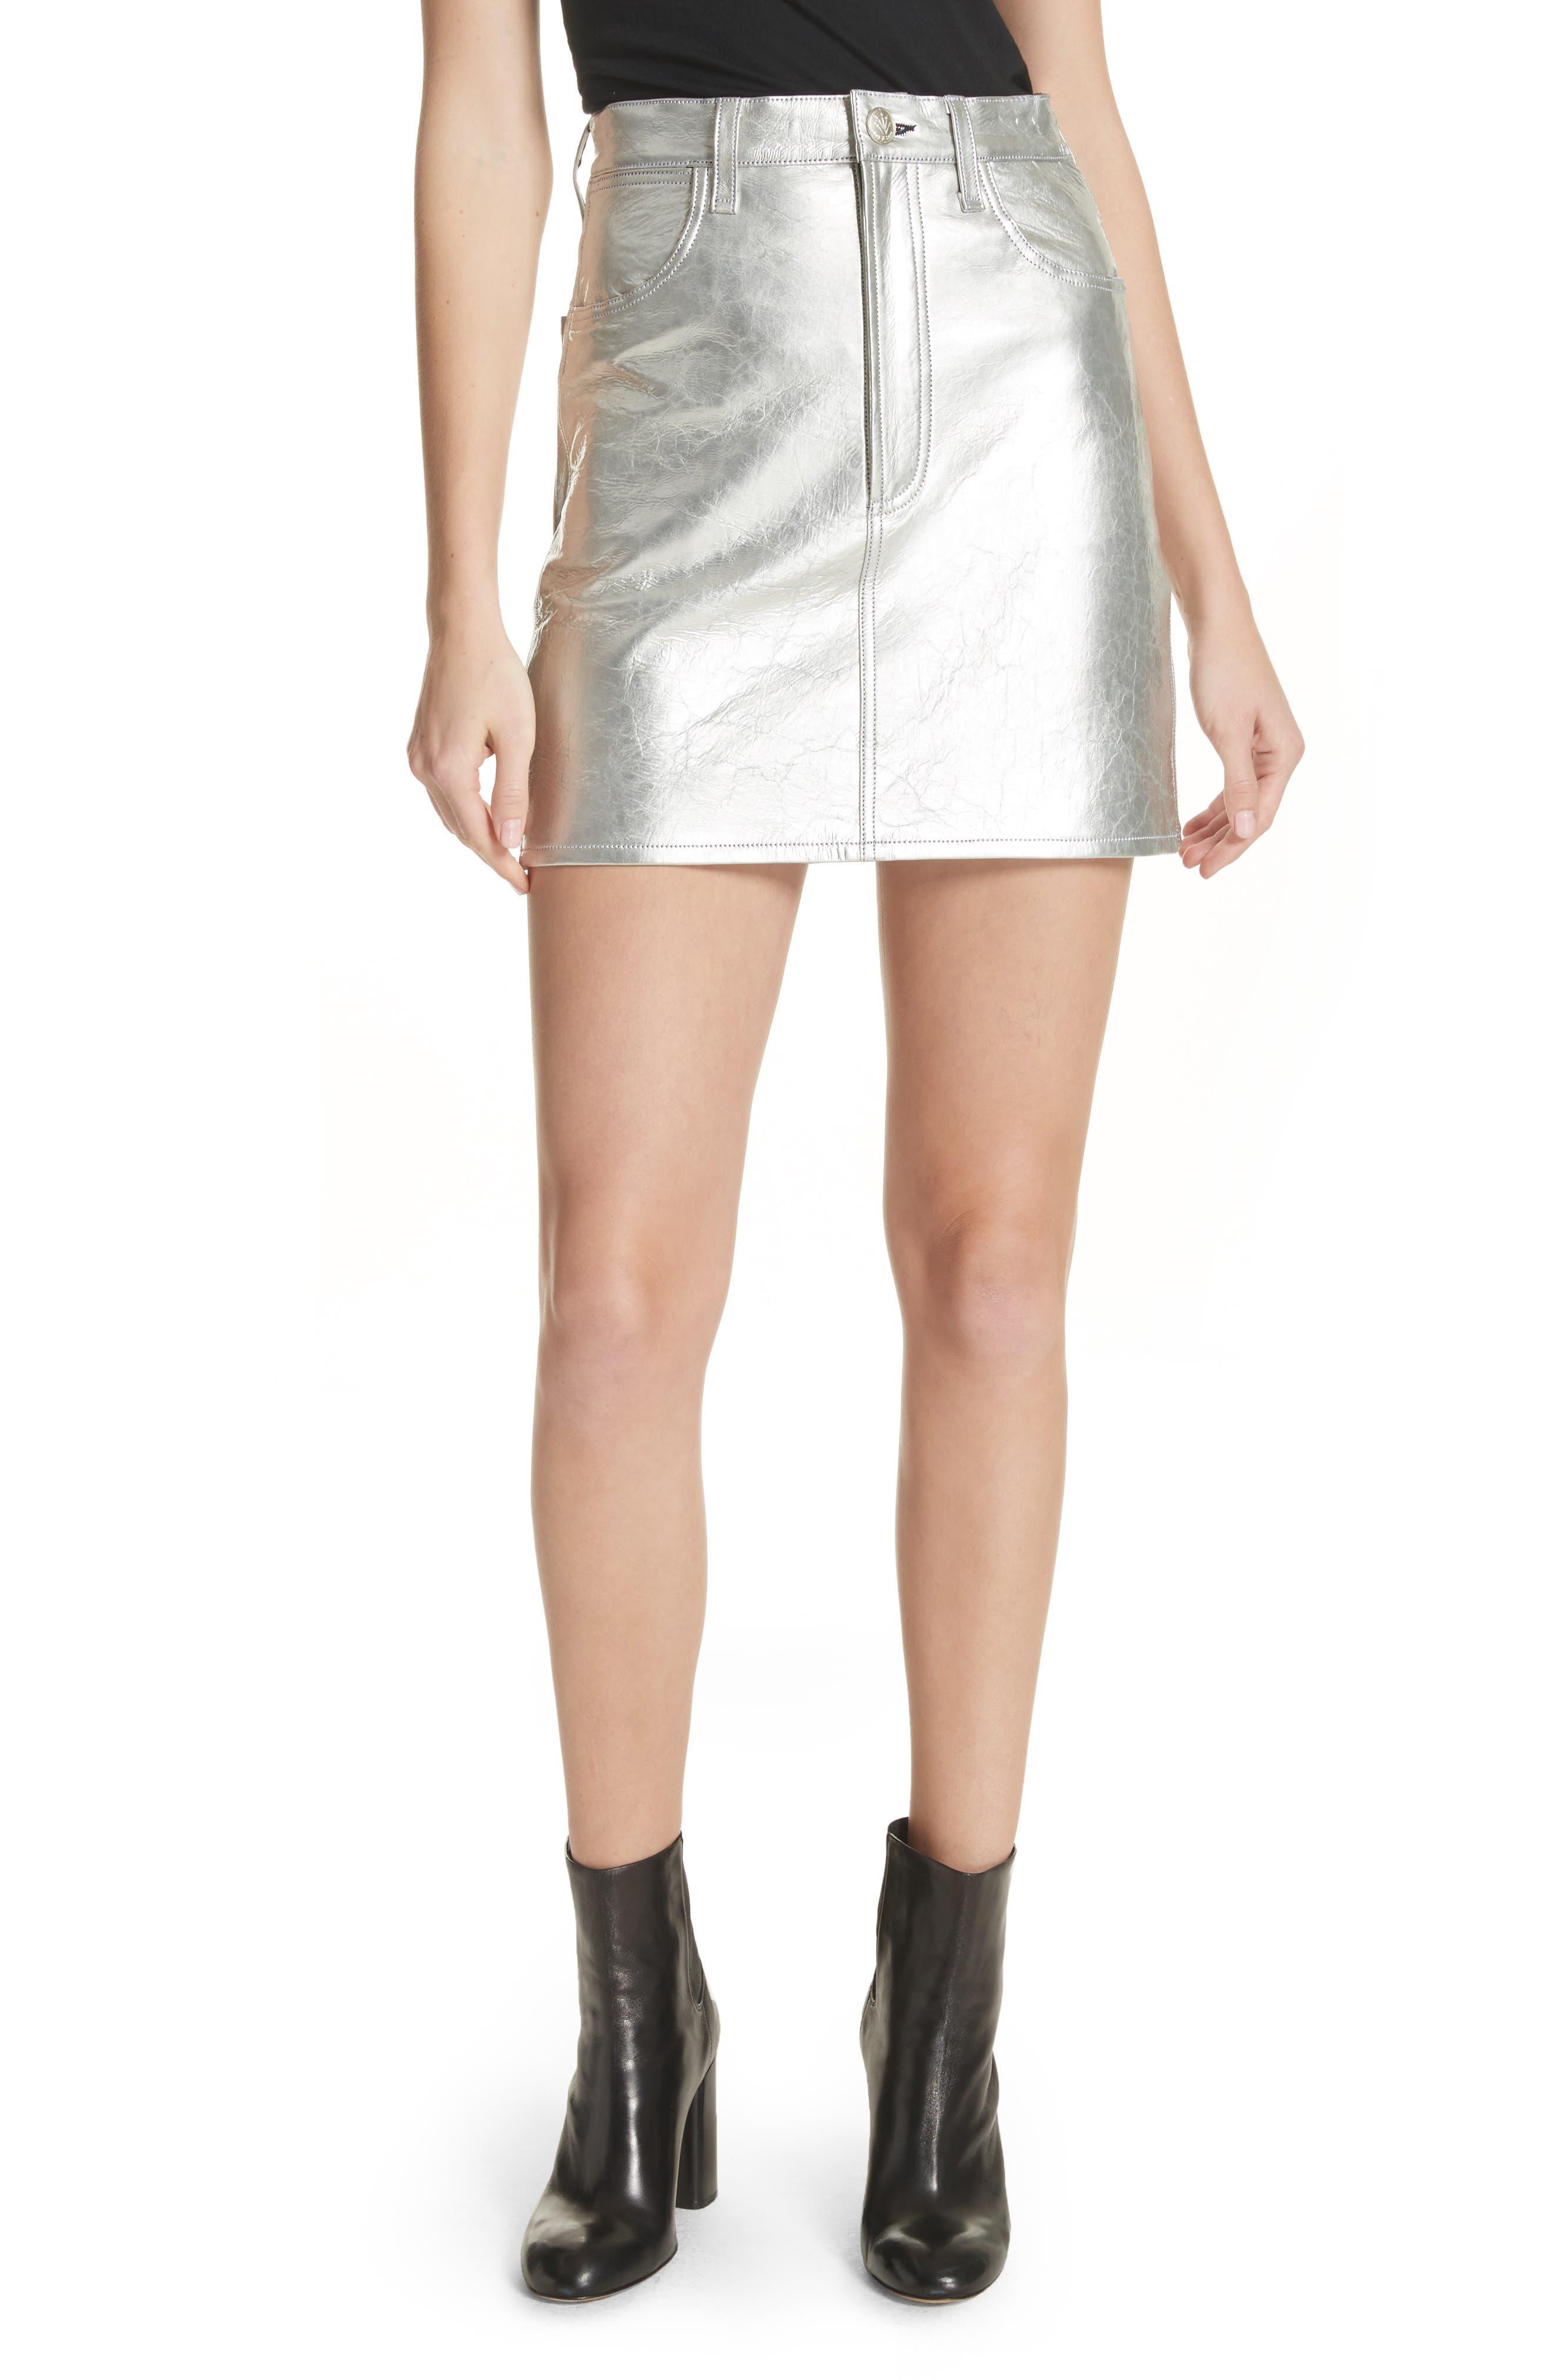 Moss High Waist Leather Miniskirt,                         Main,                         color, 041